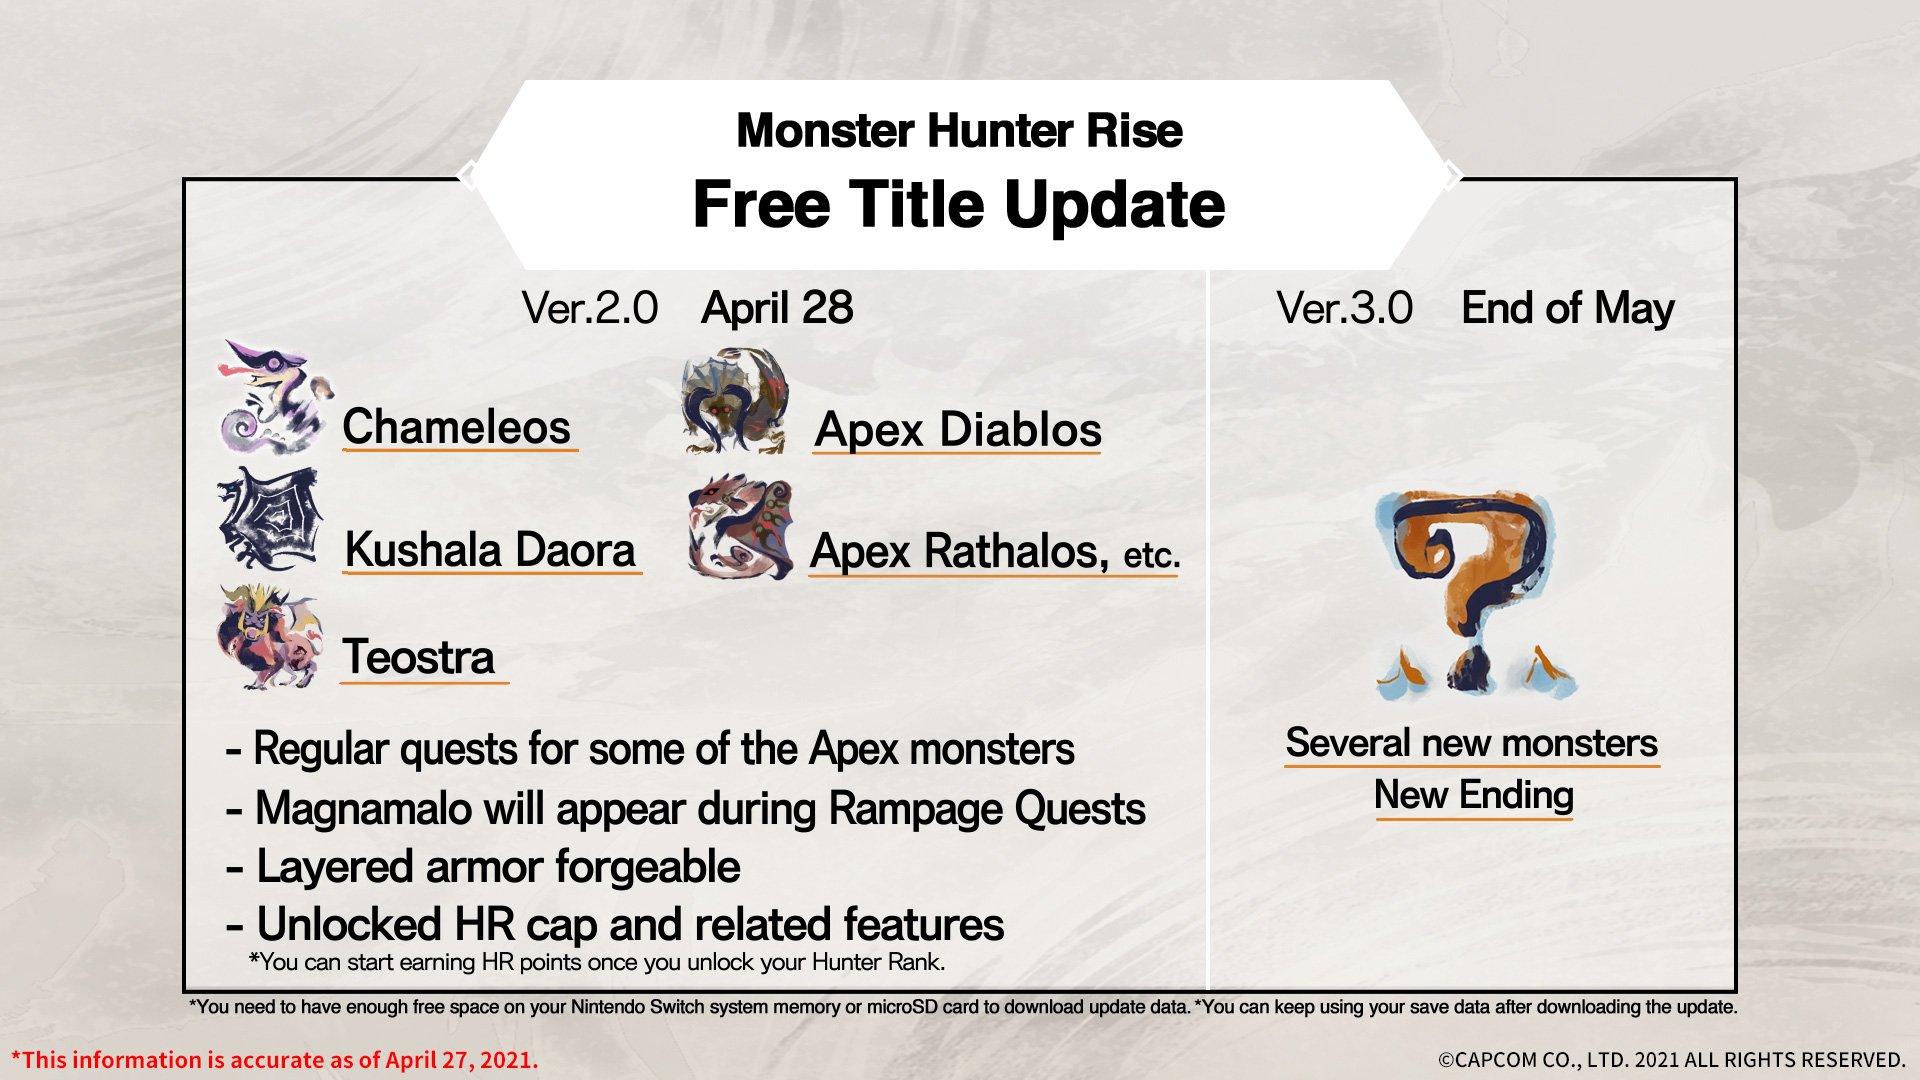 Monster Hunter 2-0 update details